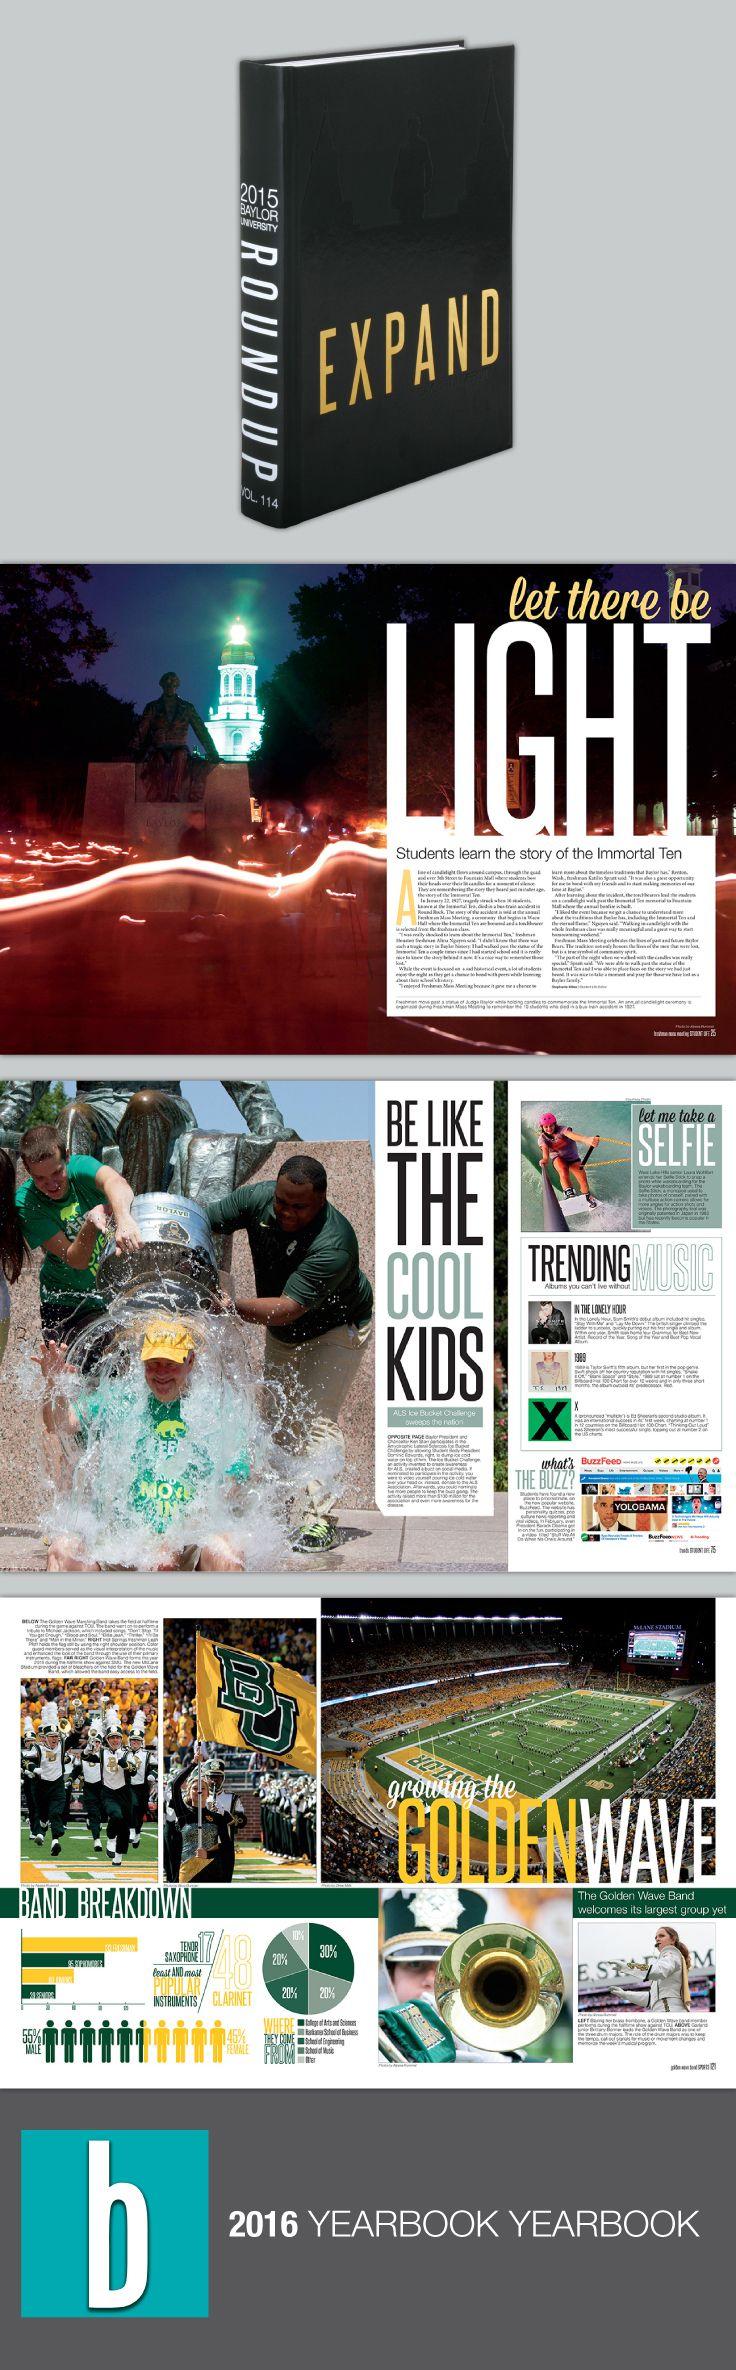 ROUNDUP Baylor University Waco Texas Yearbook Theme Pinterest